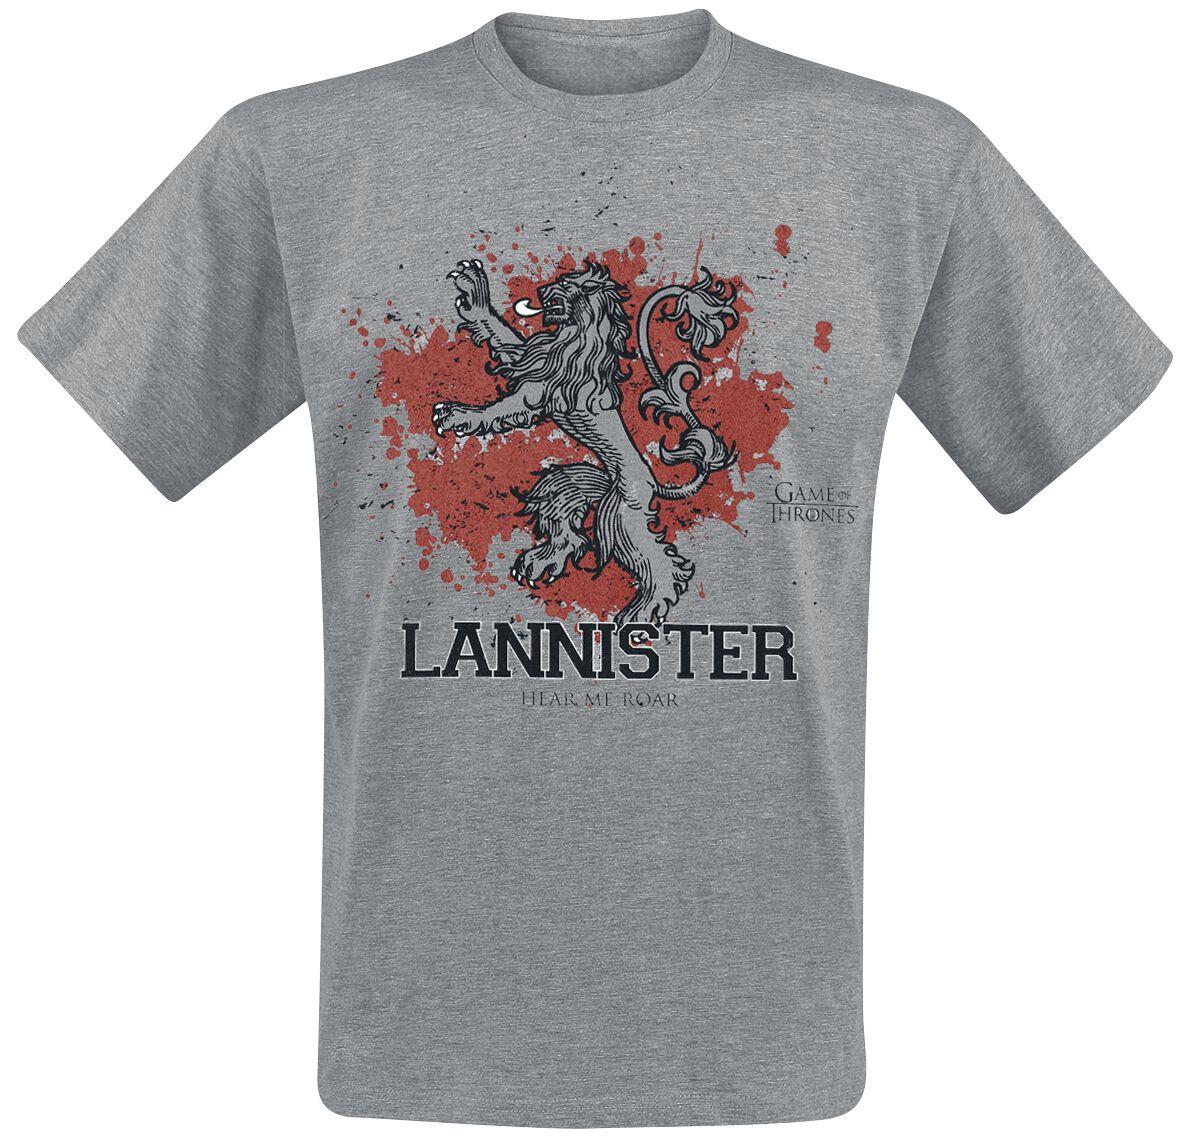 Image of   Game Of Thrones House Lannister - Lannister The Fighter T-Shirt grålig